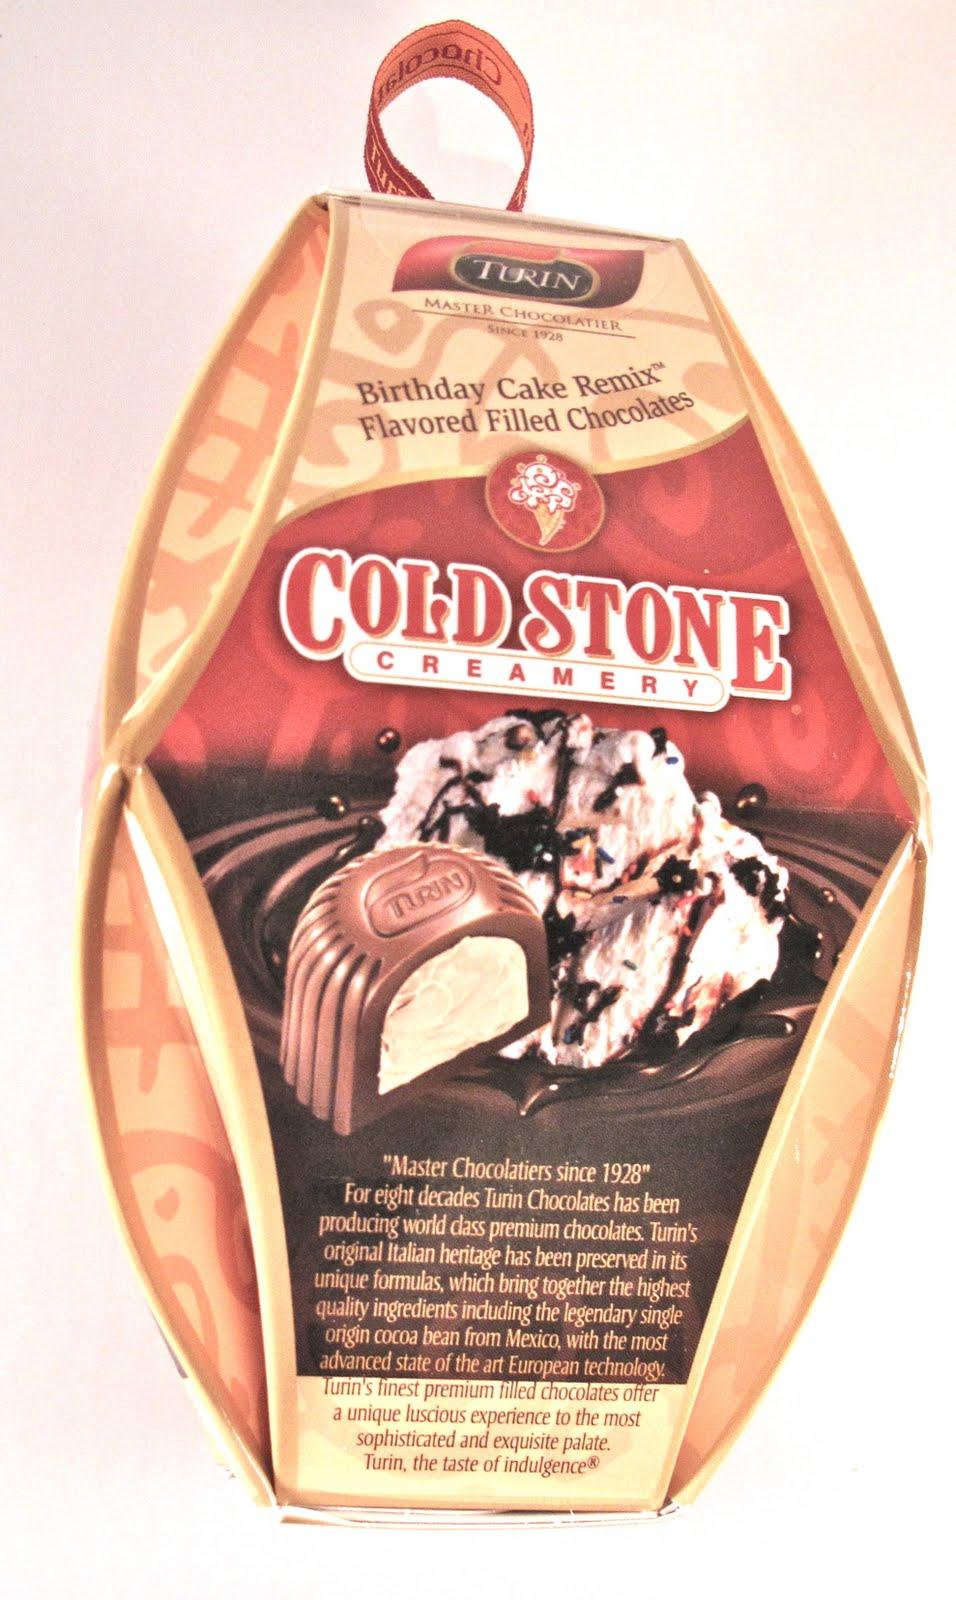 Cold stone ice cream cake coupon 2018